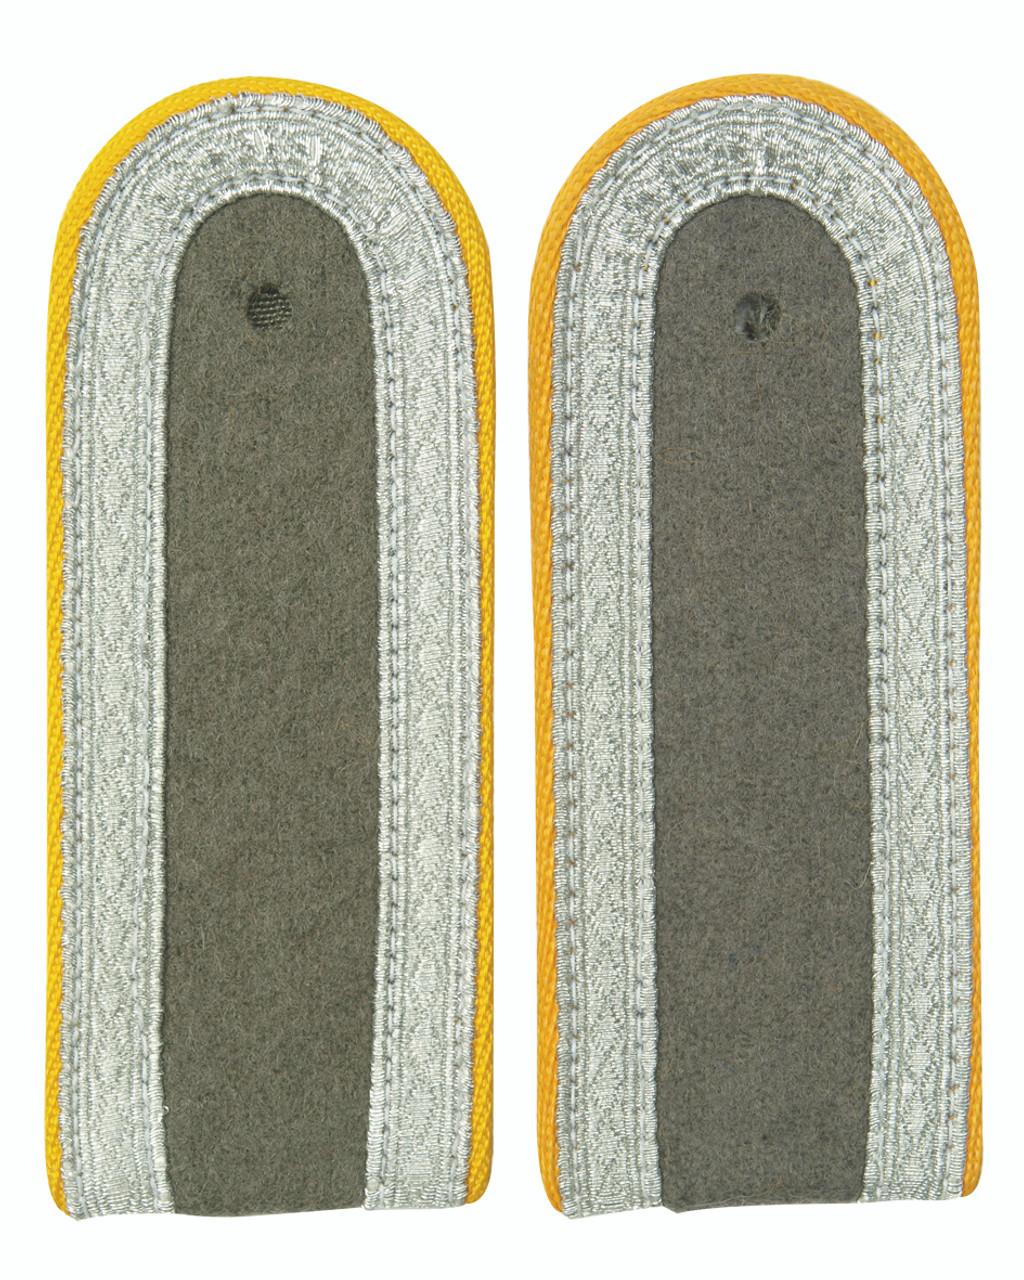 NVA NCO Shoulder Boards - Signals